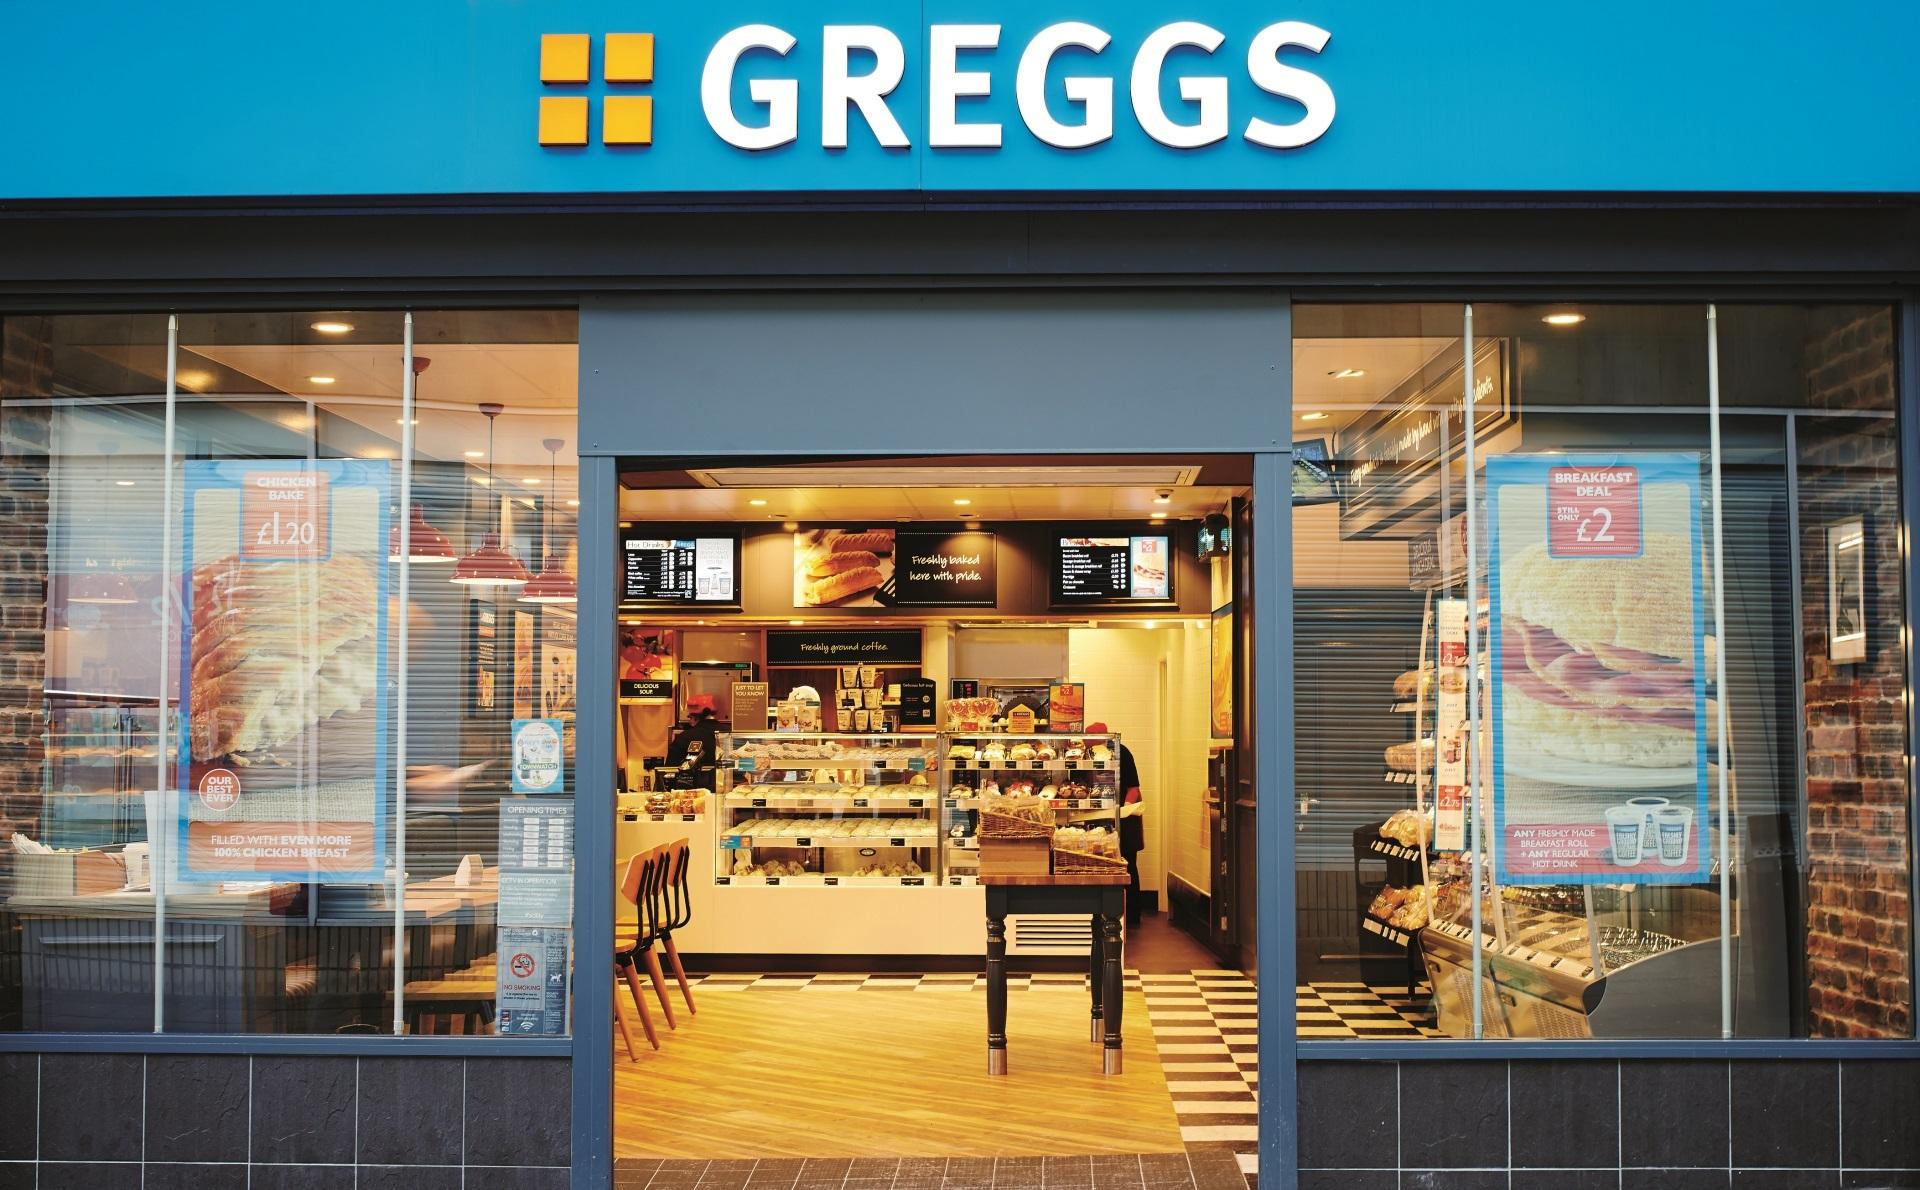 New Look Greggs Open For Business In Penarth Penarth Times